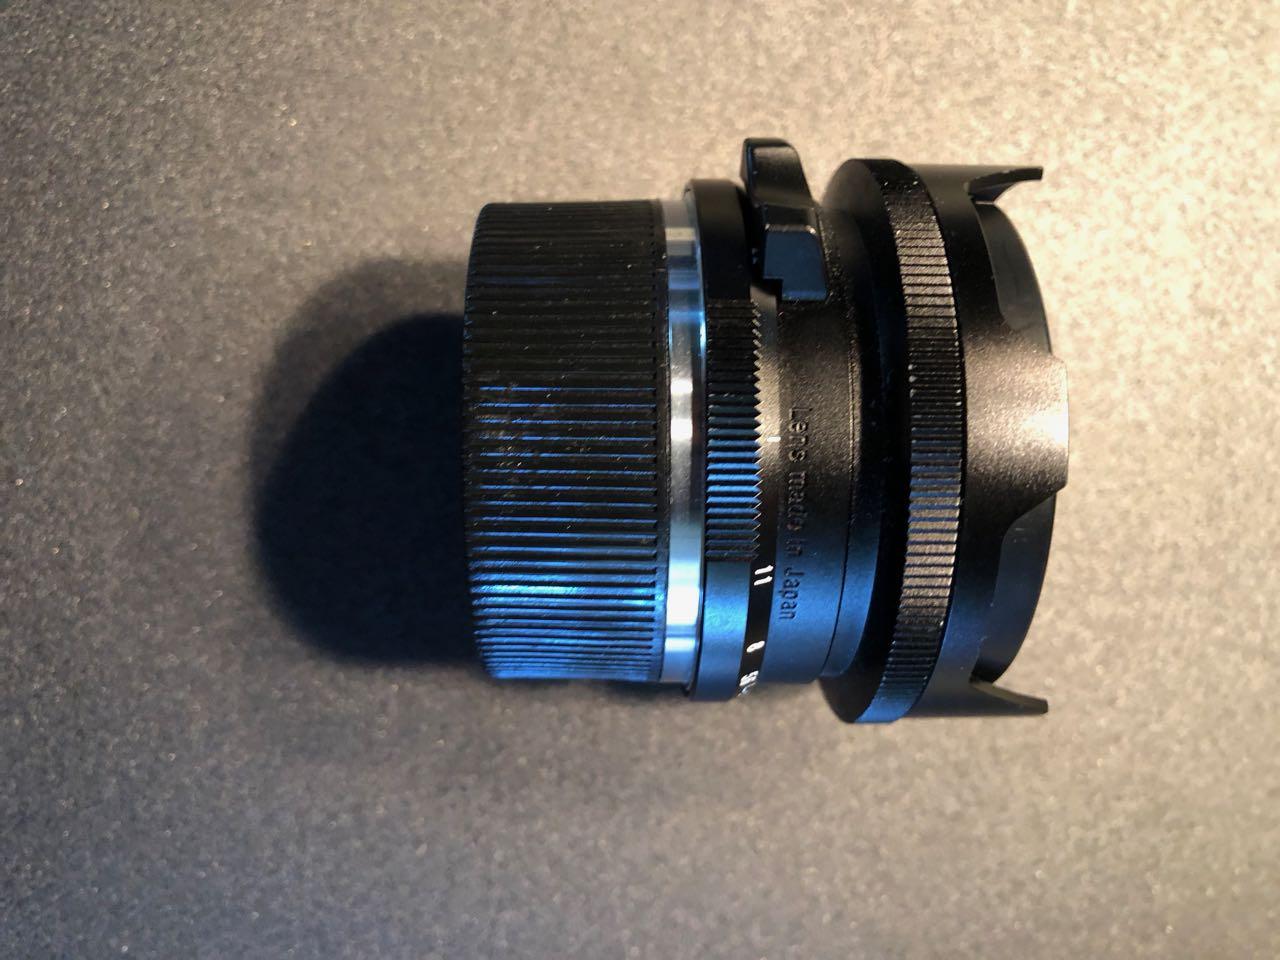 Voit 15mm V2 by esy0345 in Regular Member Gallery